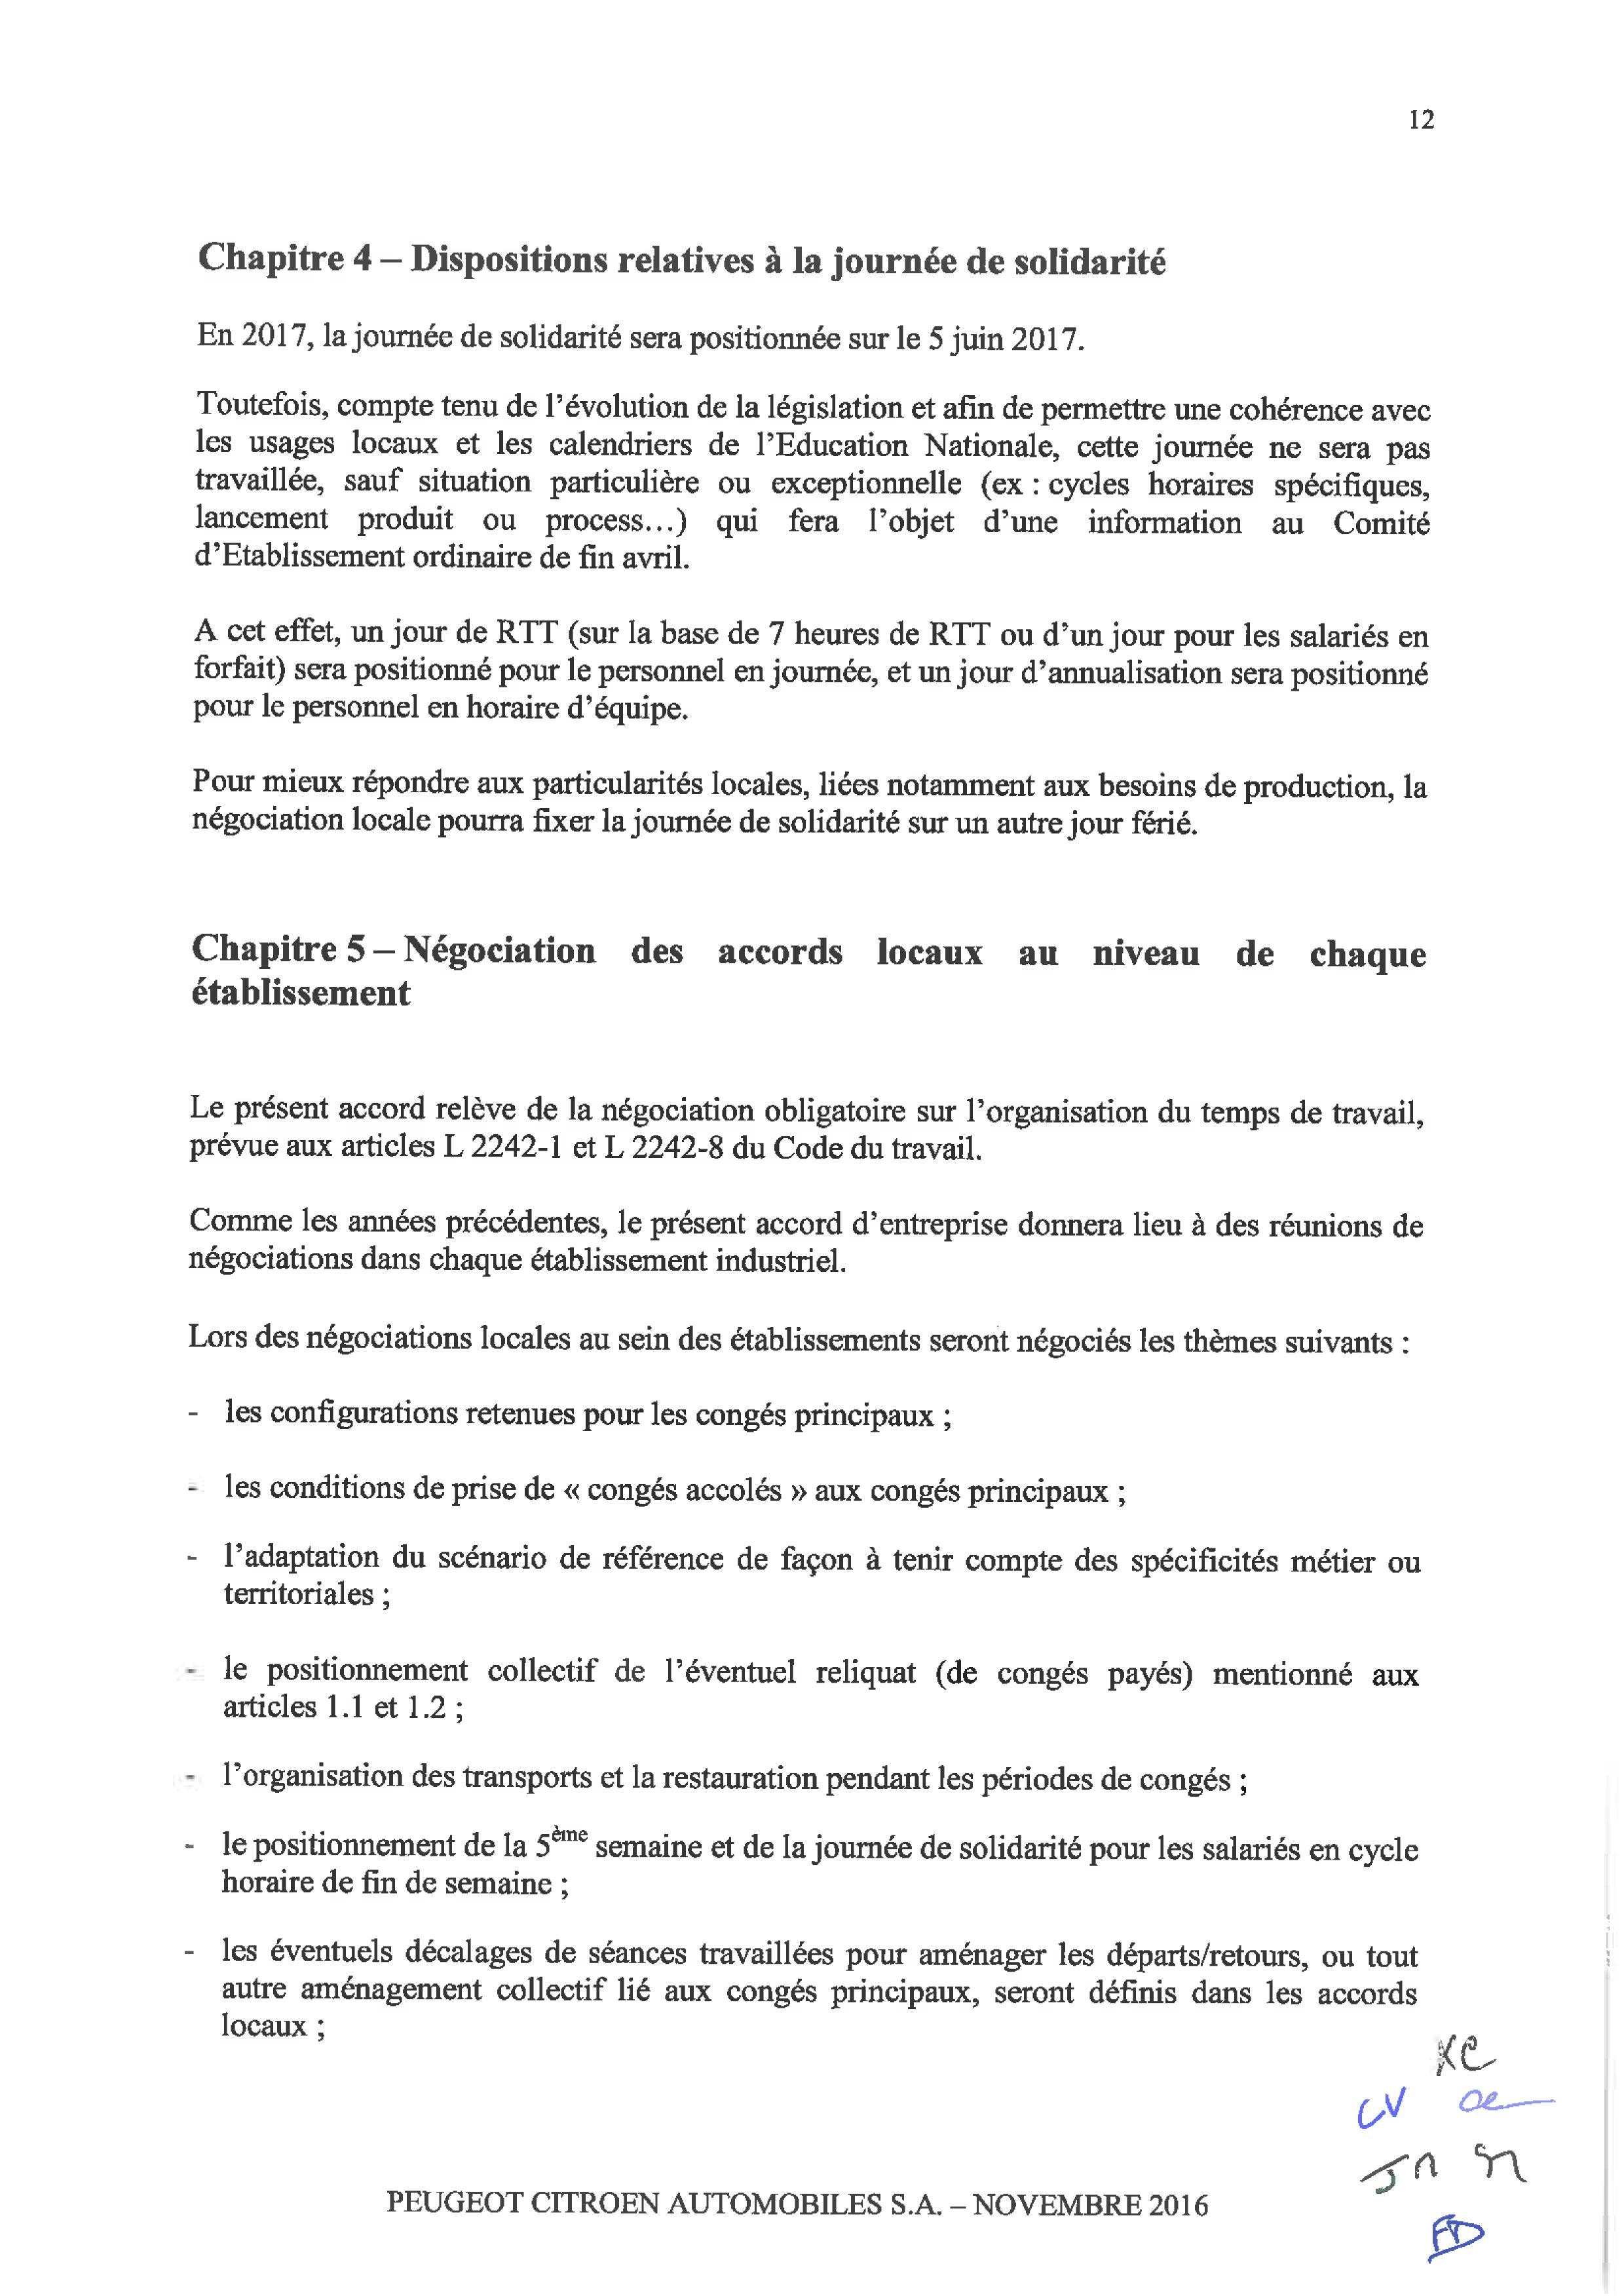 Accord centrale TT Congés_11